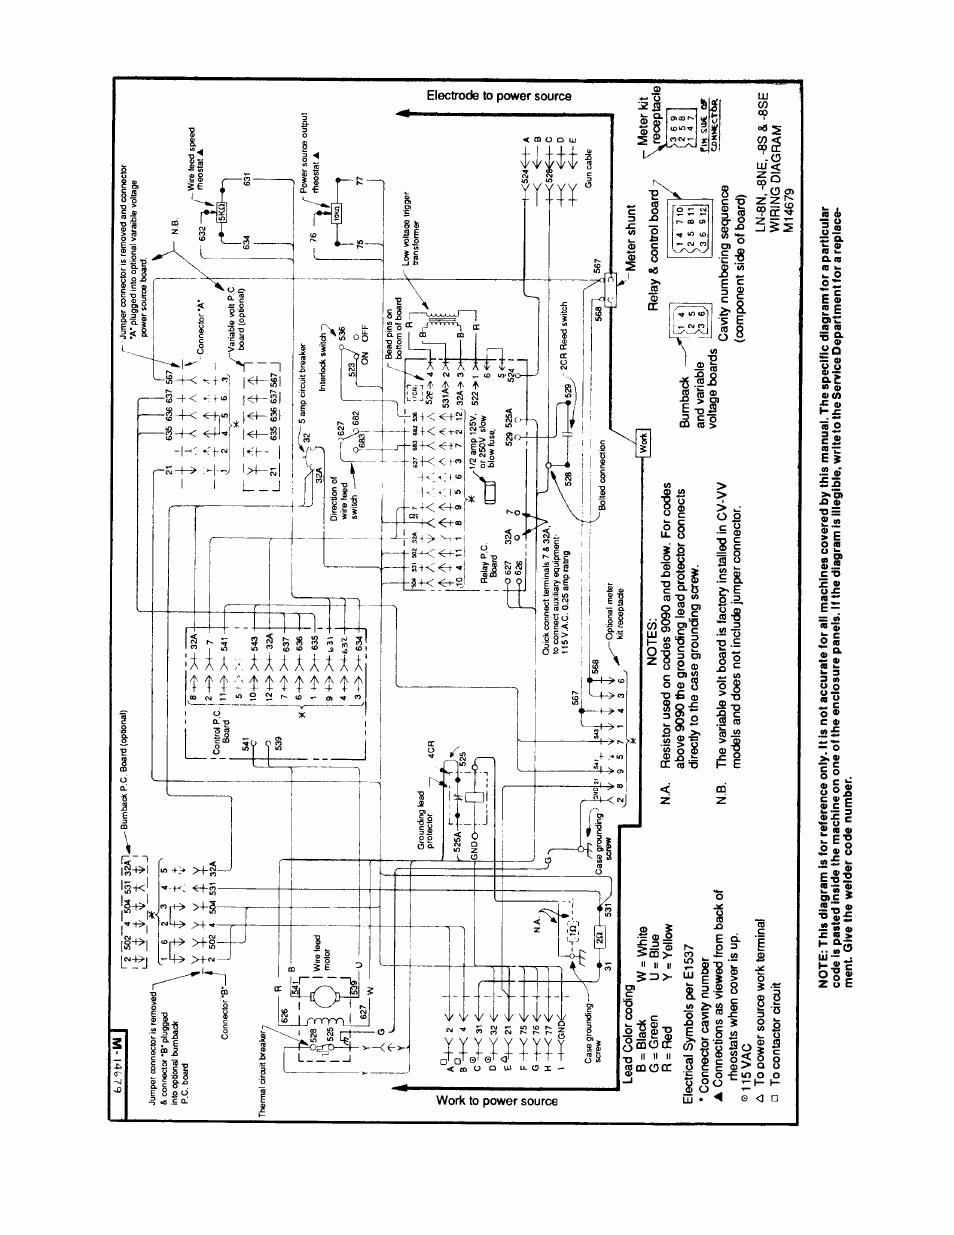 [DIAGRAM] Porsche 993 User Wiring Diagram FULL Version HD